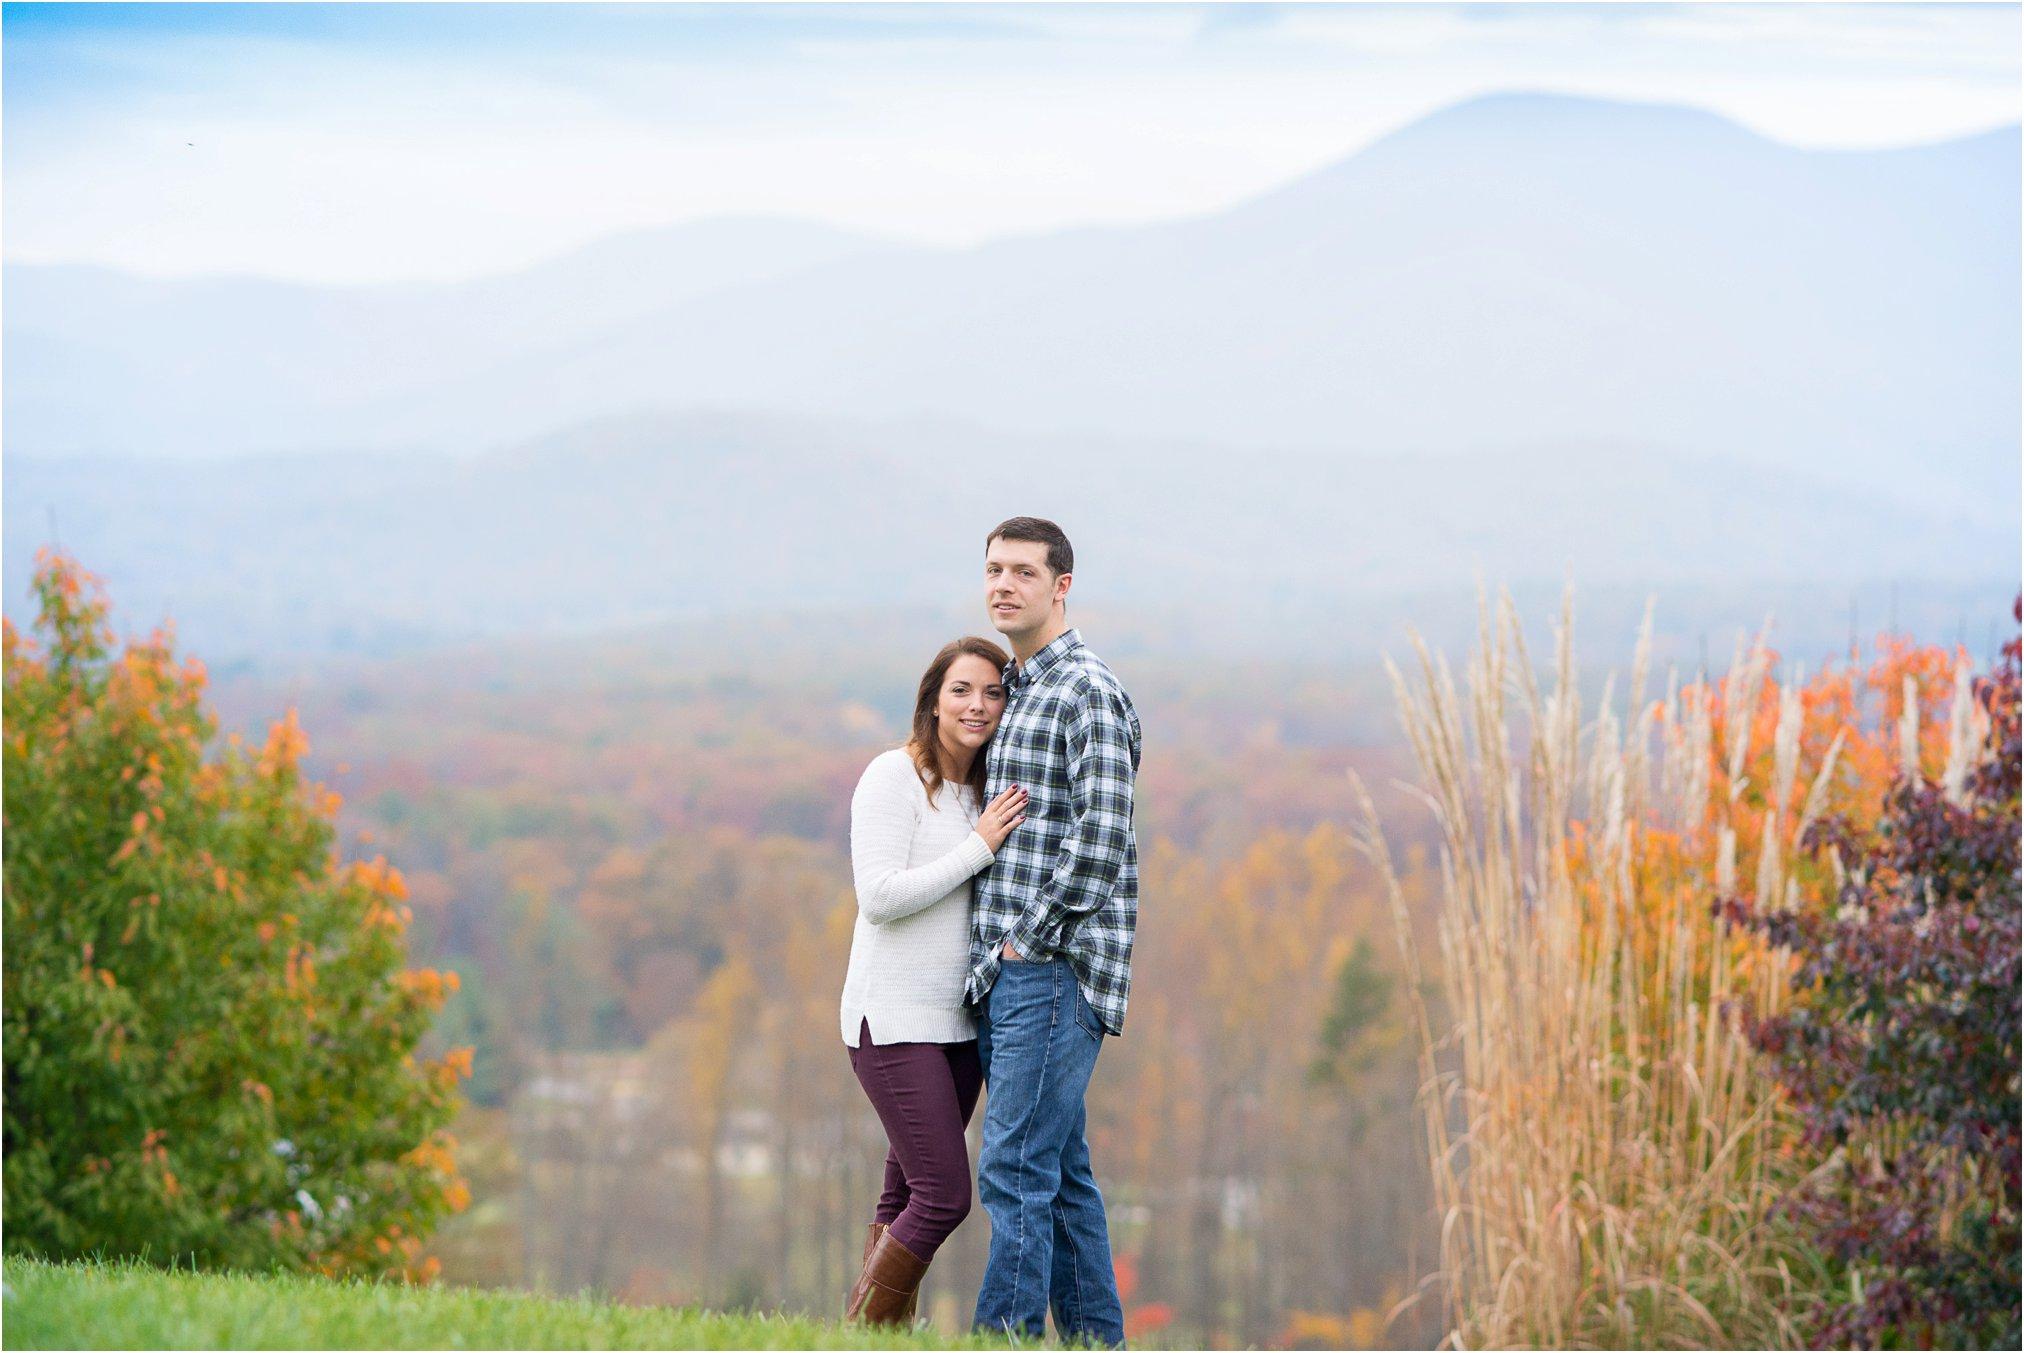 Nelson County Engagement-1-3.jpg